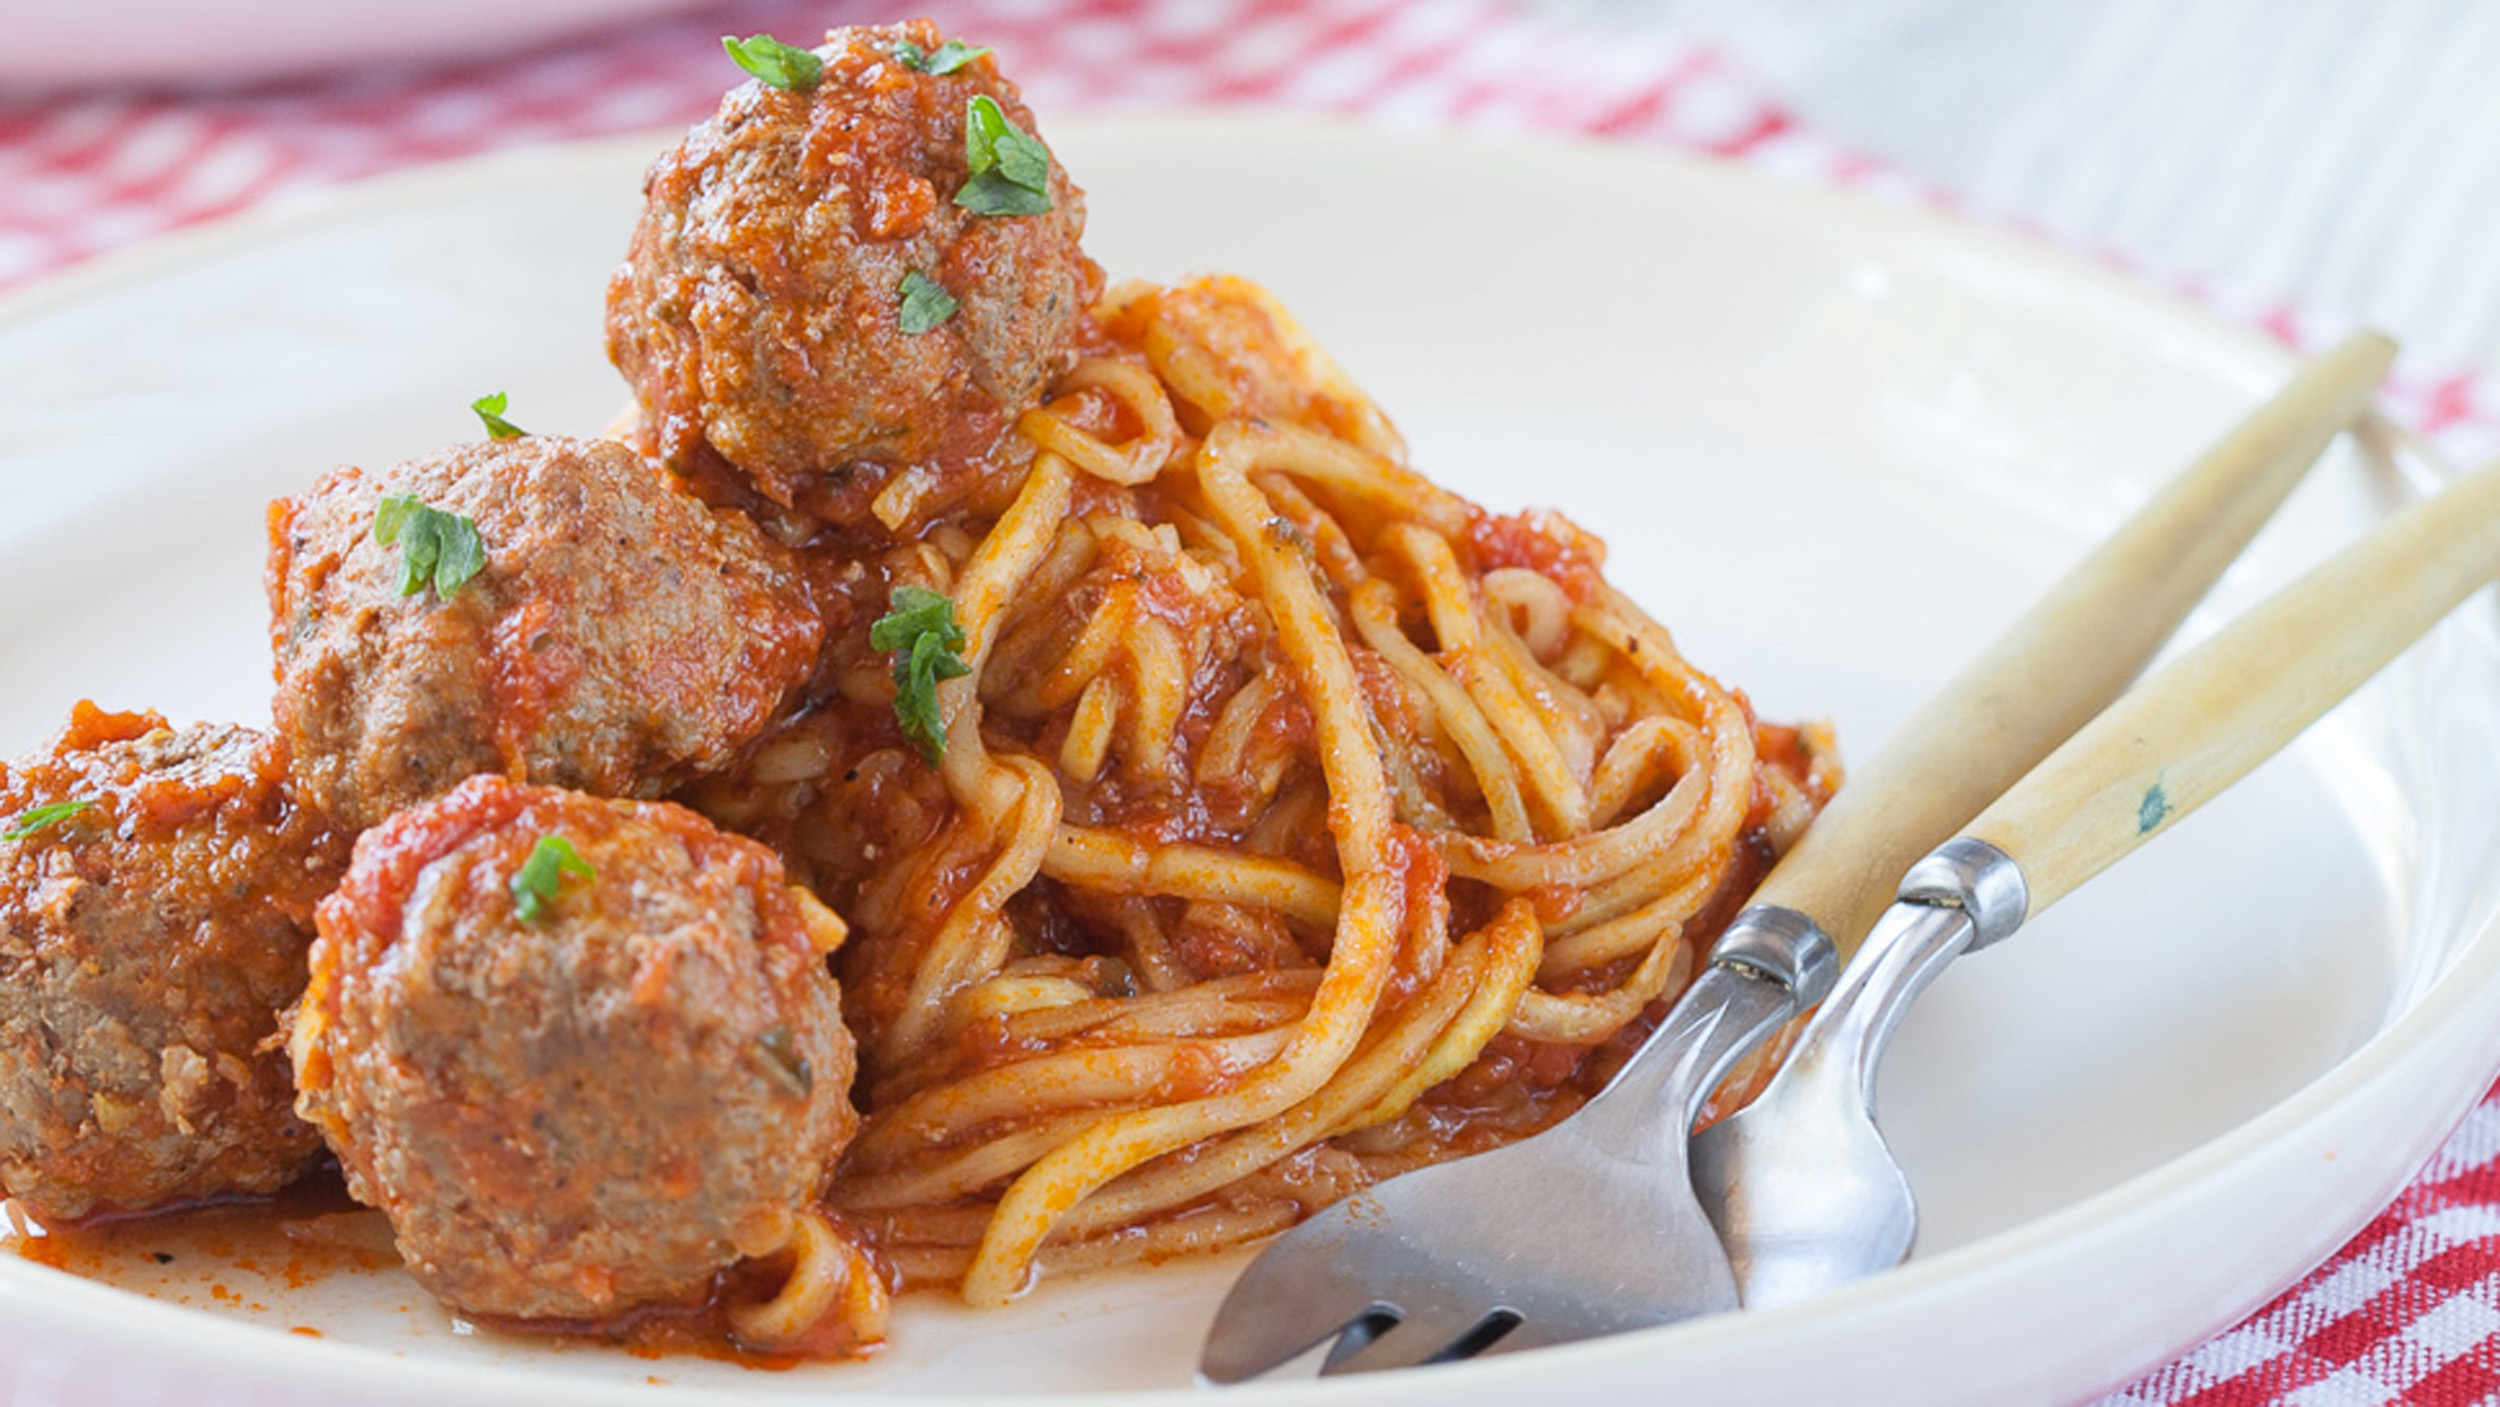 Caveman comfort food! 5 paleo recipes for popular dishes